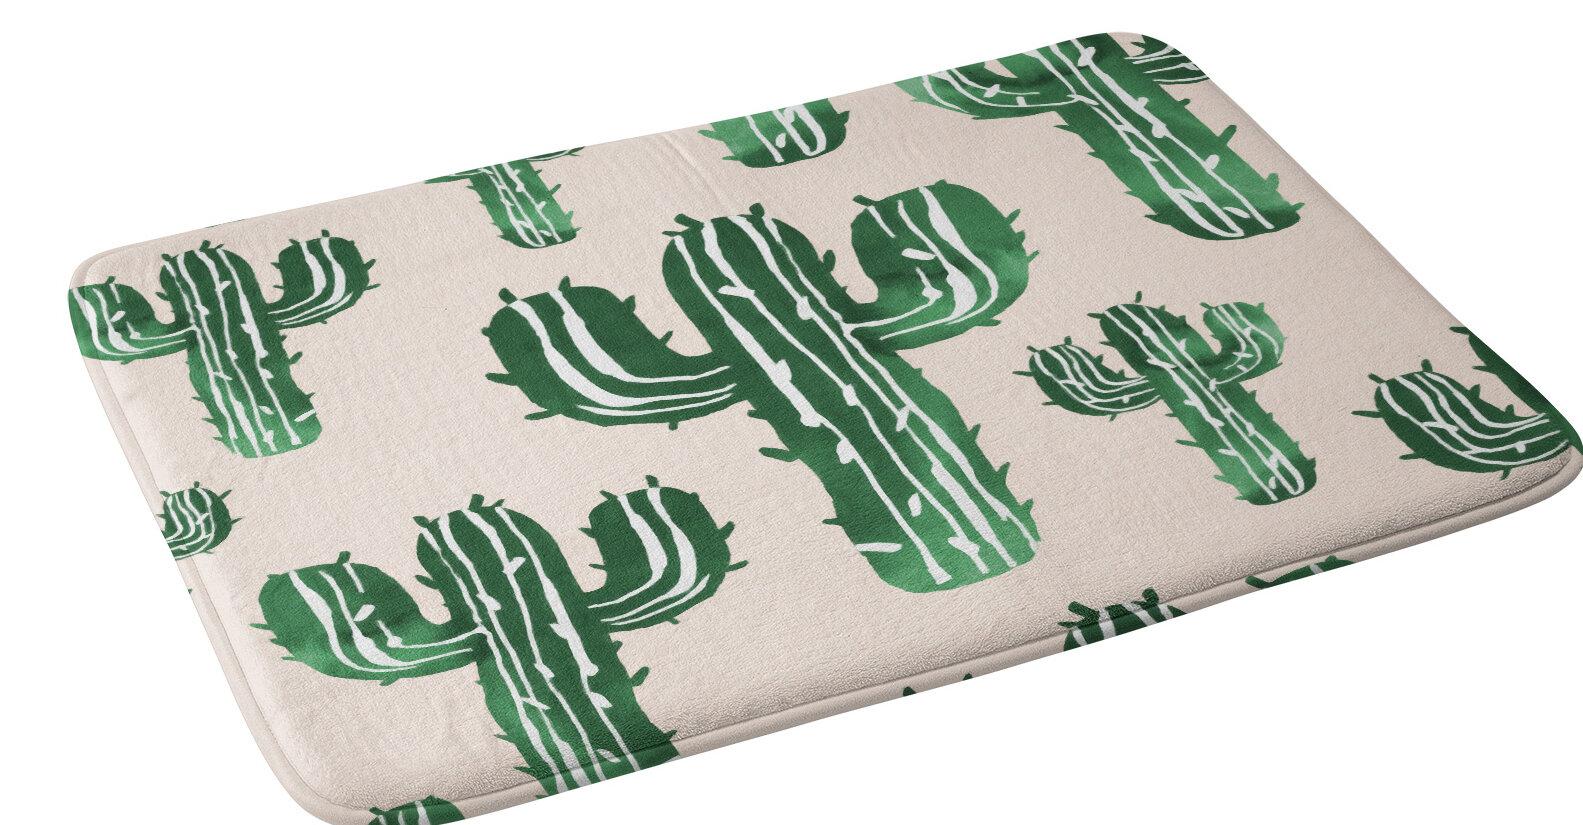 East Urban Home Susanne Kasielke Cactus Party Desert Matcha Floral Bath Rug Wayfair